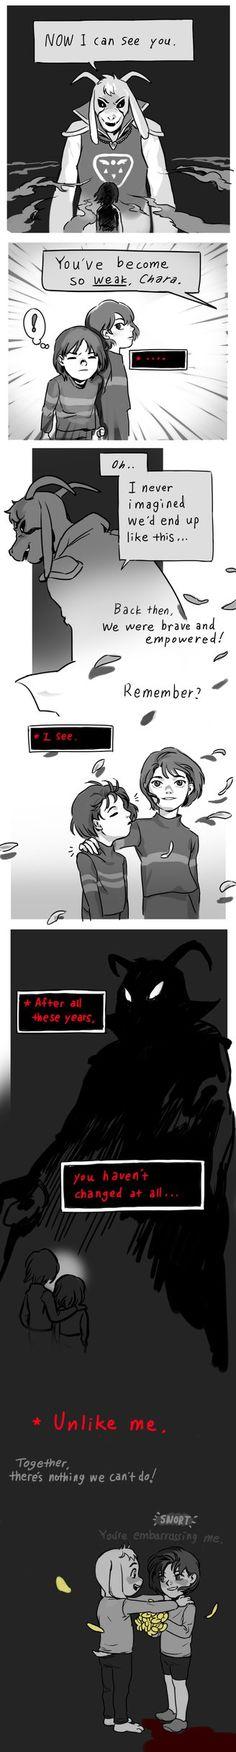 Undertale Comic: What if.. by alganiq